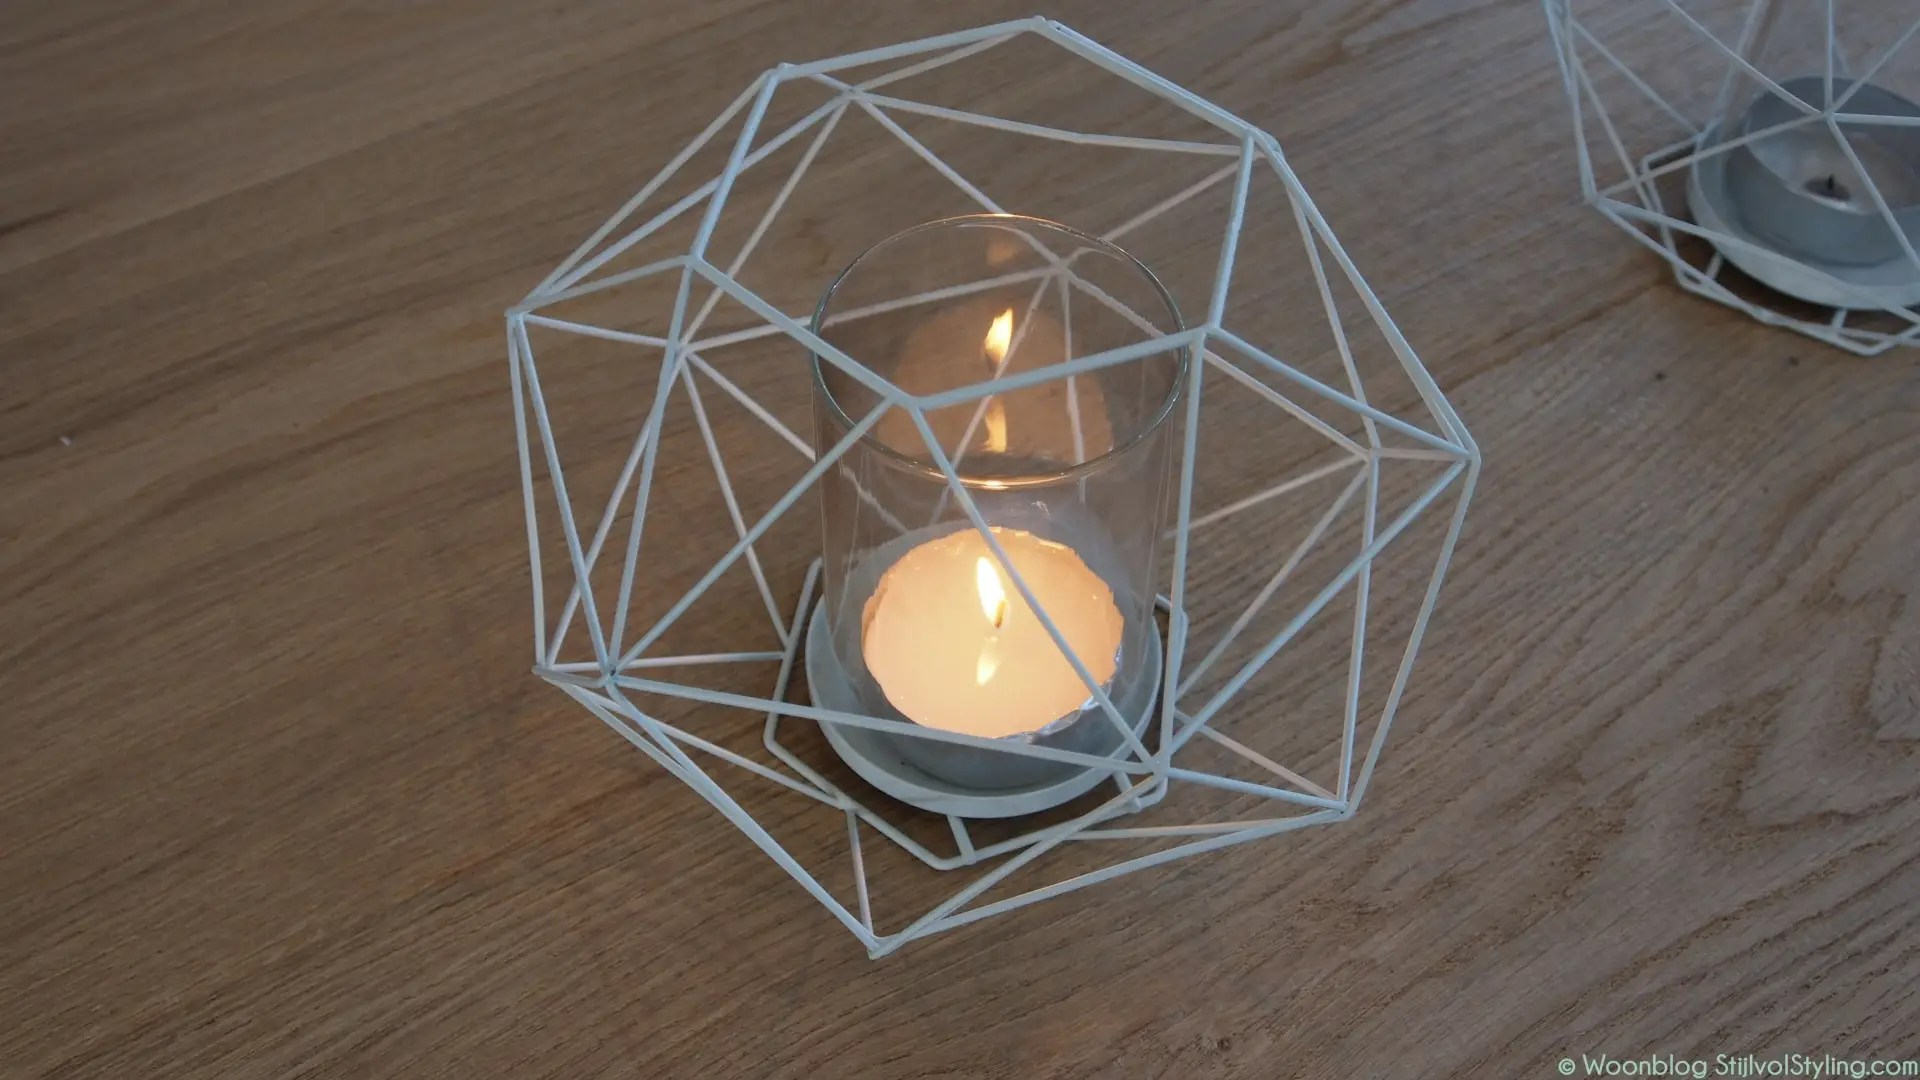 Interieur geometrische vormen in jouw interieur u2022 stijlvol styling